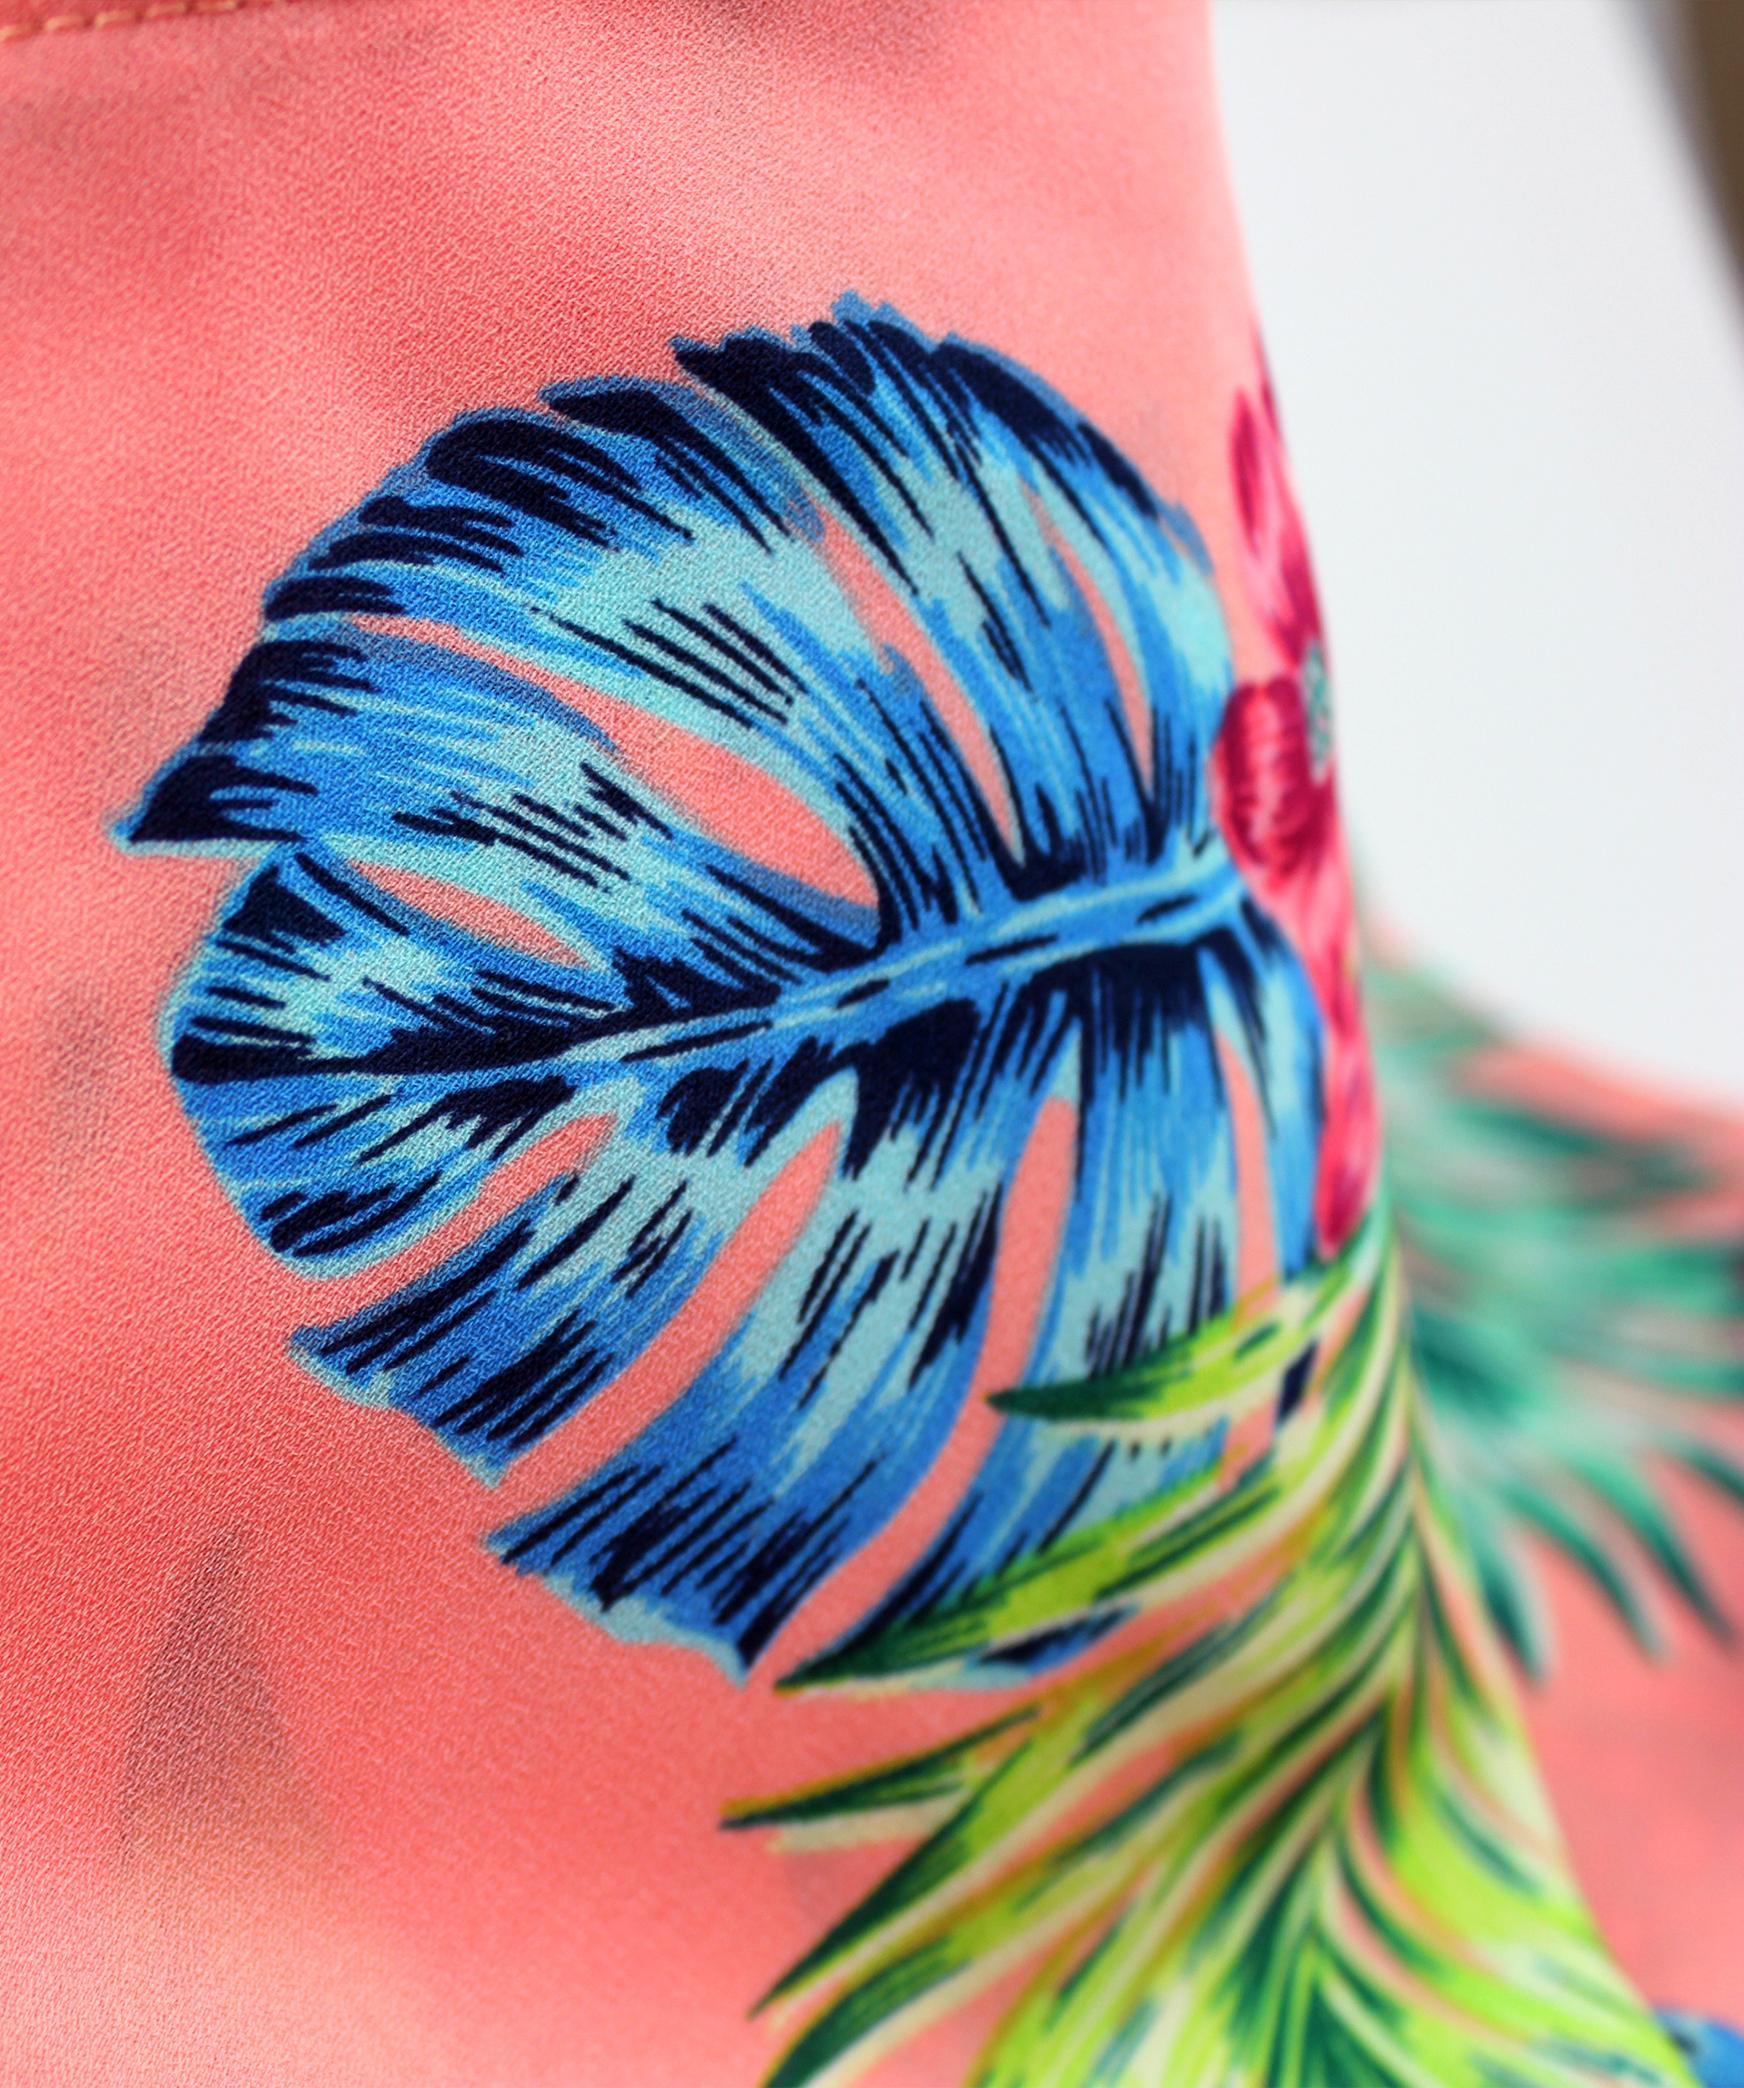 Masca dama 2in1 esarfa colorata